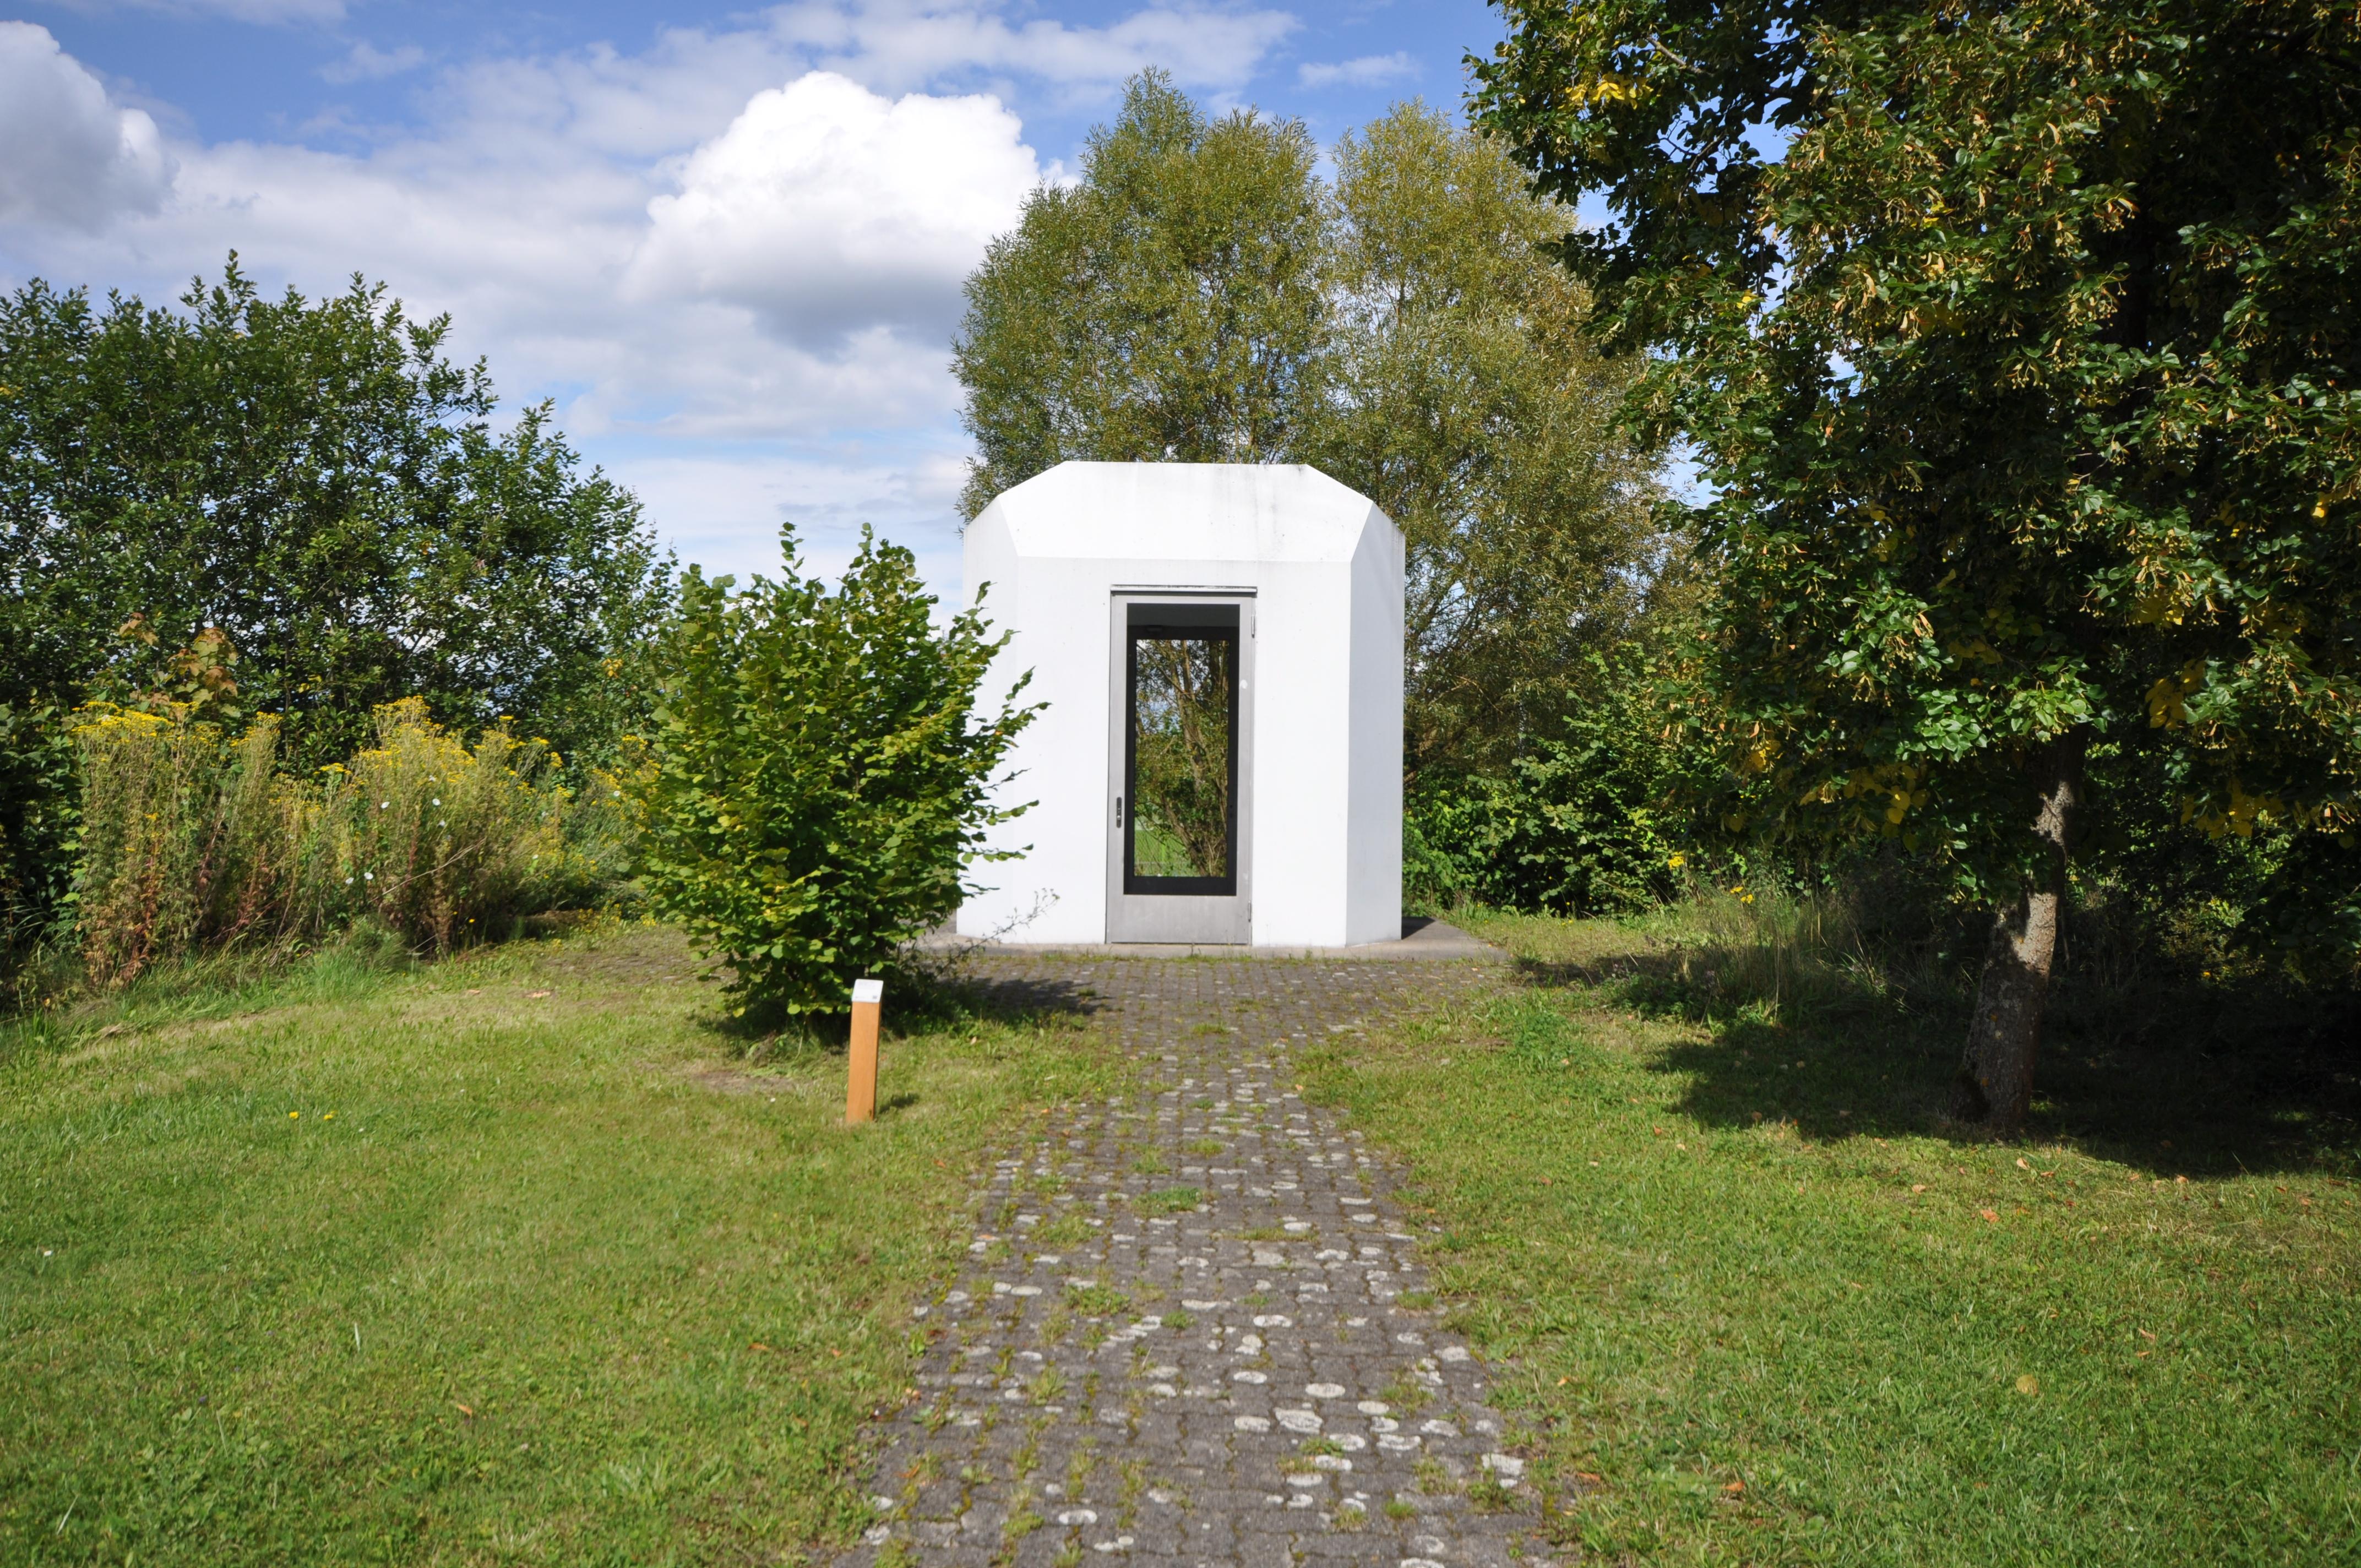 file pavillon kunstwerk von peter storrer in hirzenbach  file pavillon kunstwerk von peter storrer in hirzenbach 2014 08